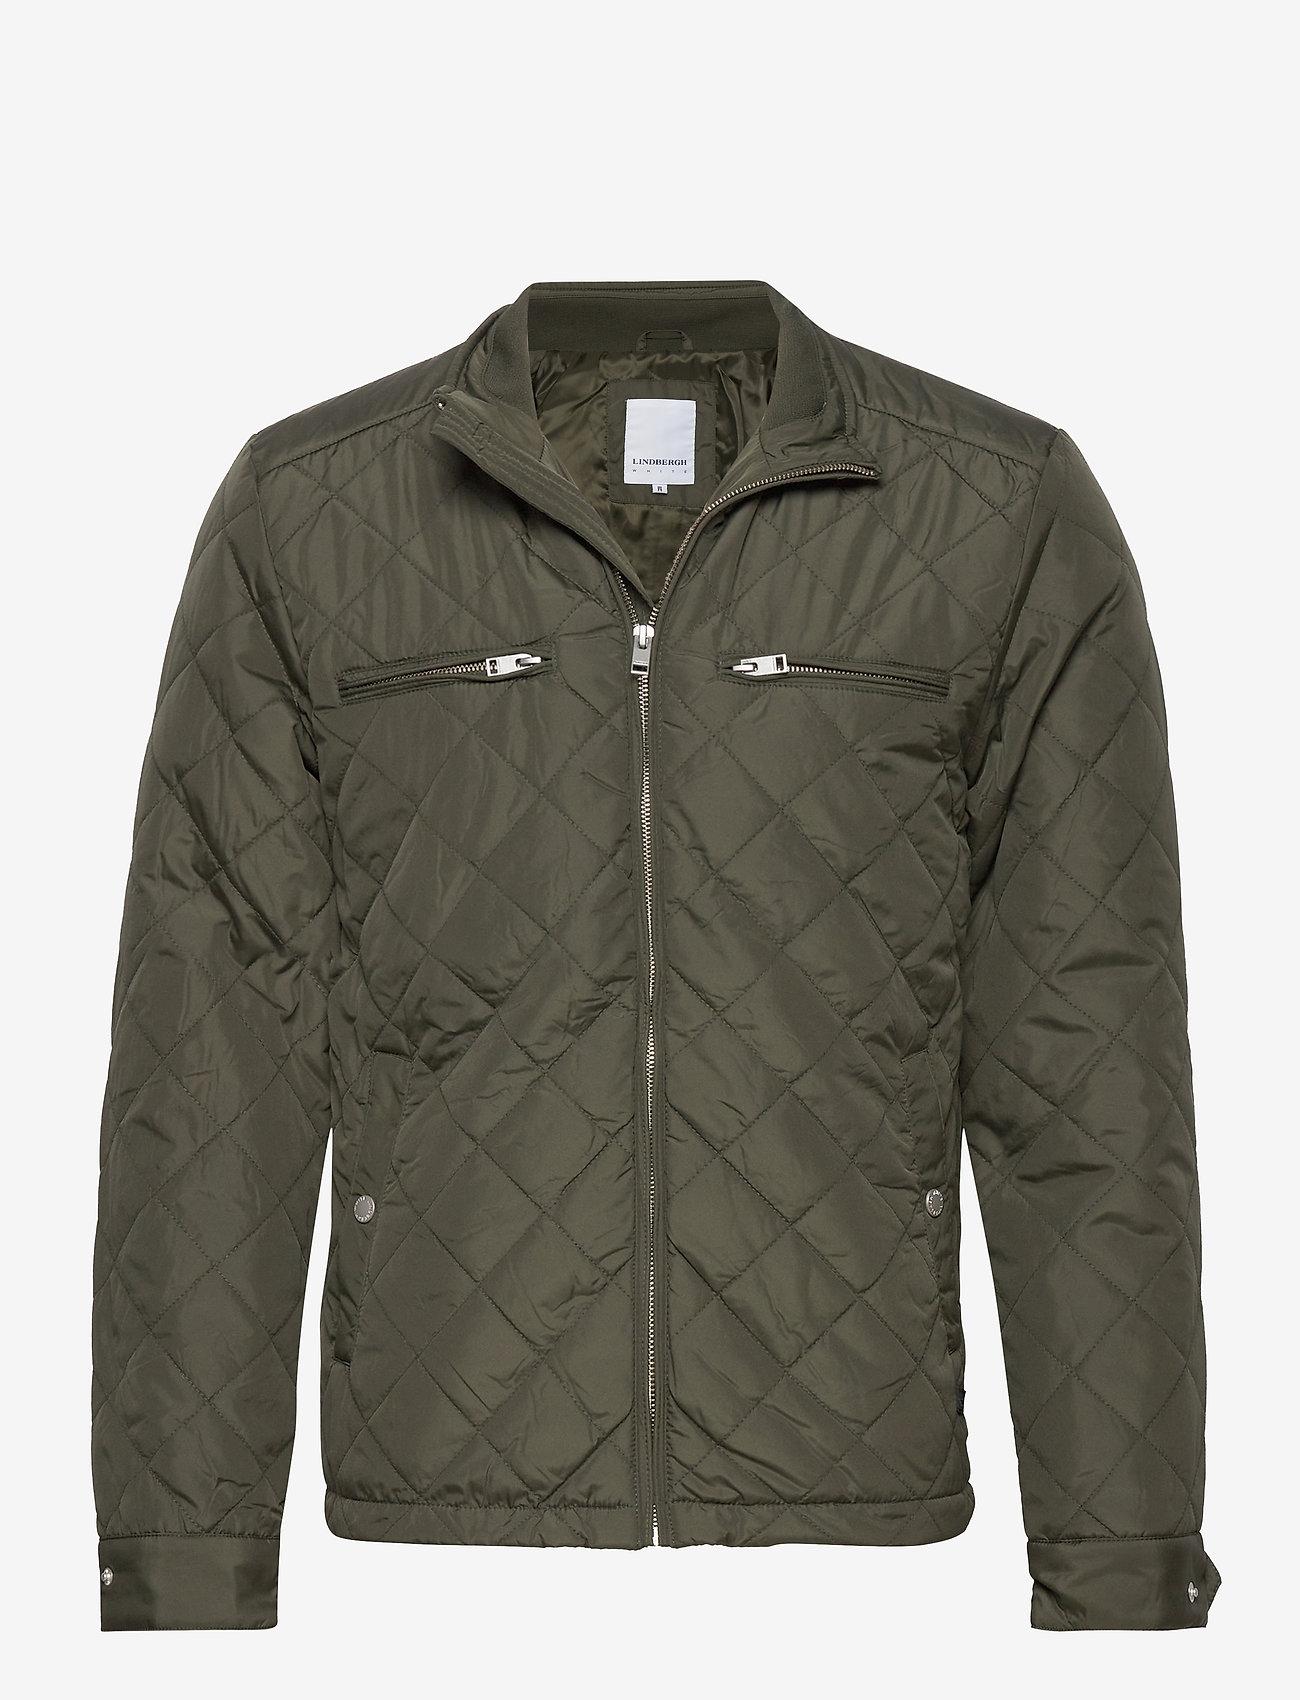 Lindbergh Quilted jacket - Jakker og frakker ARMY - Menn Klær